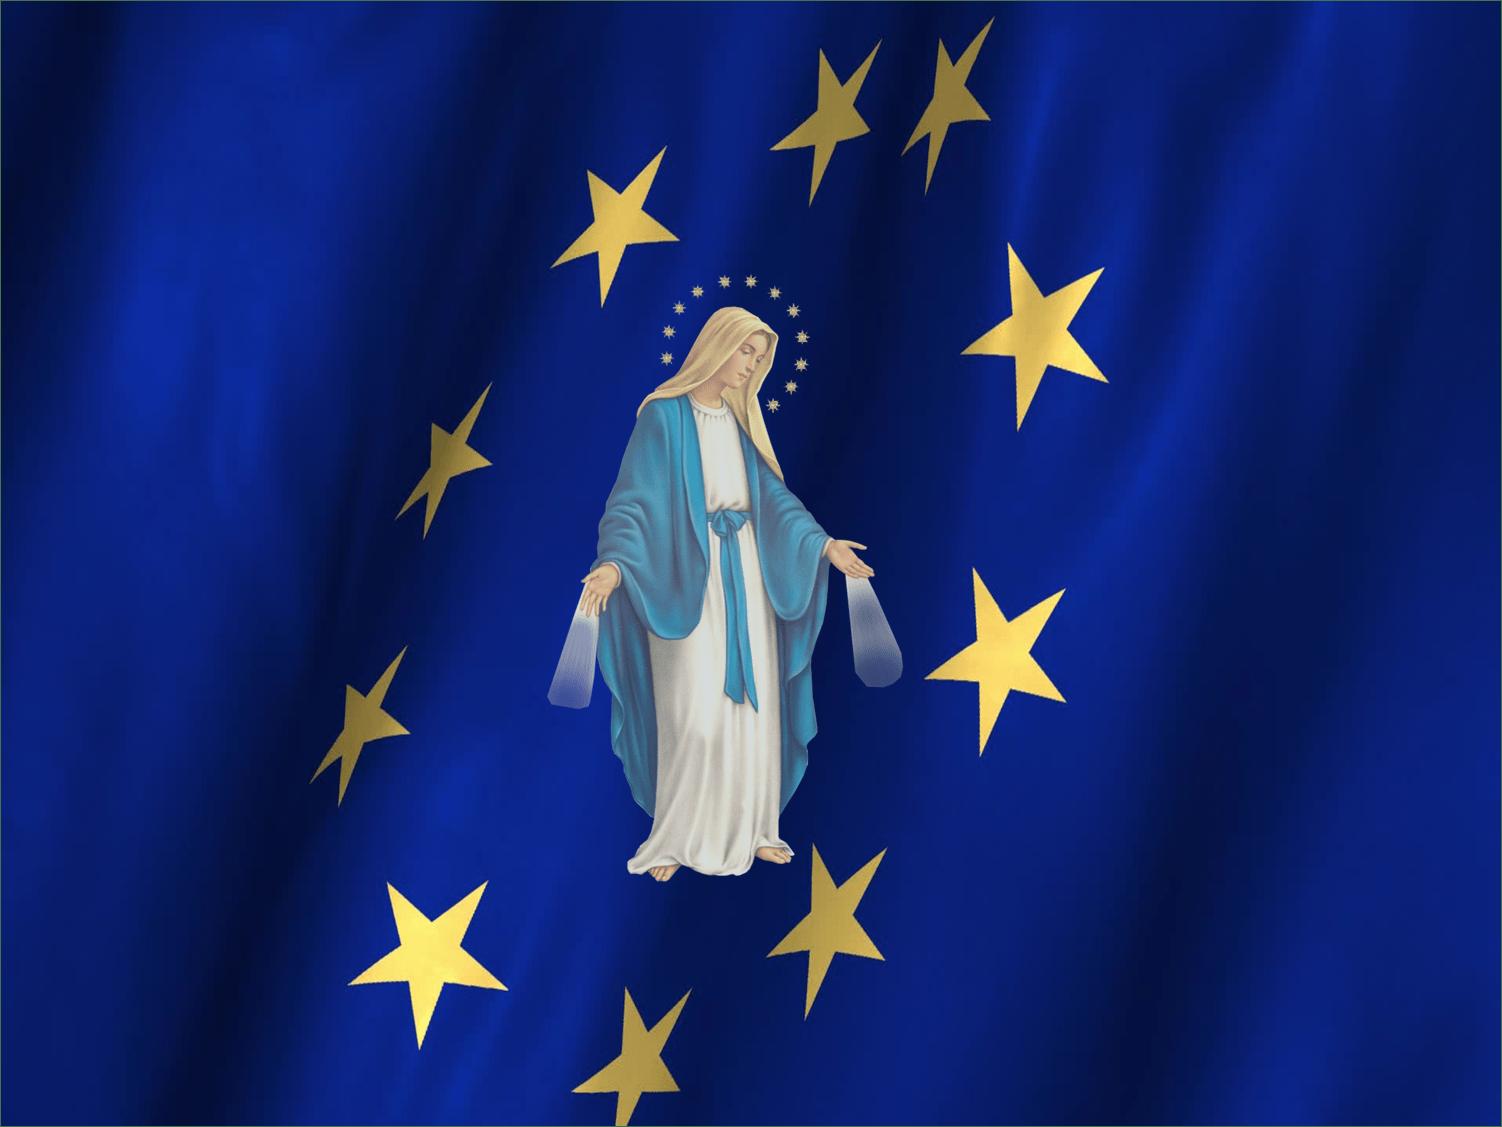 virgen-maria-apariciones-marianas-aparicion-milagros-cristianismo-religion-union-europea-banderas-simbolos-simbologia-simbolismos-historia-espiritualidad-arsene-heitz-medalla-milagrosa-apocalipsis-catolico-catolicismo-misterios-enigmas-inmaculada-concepcion